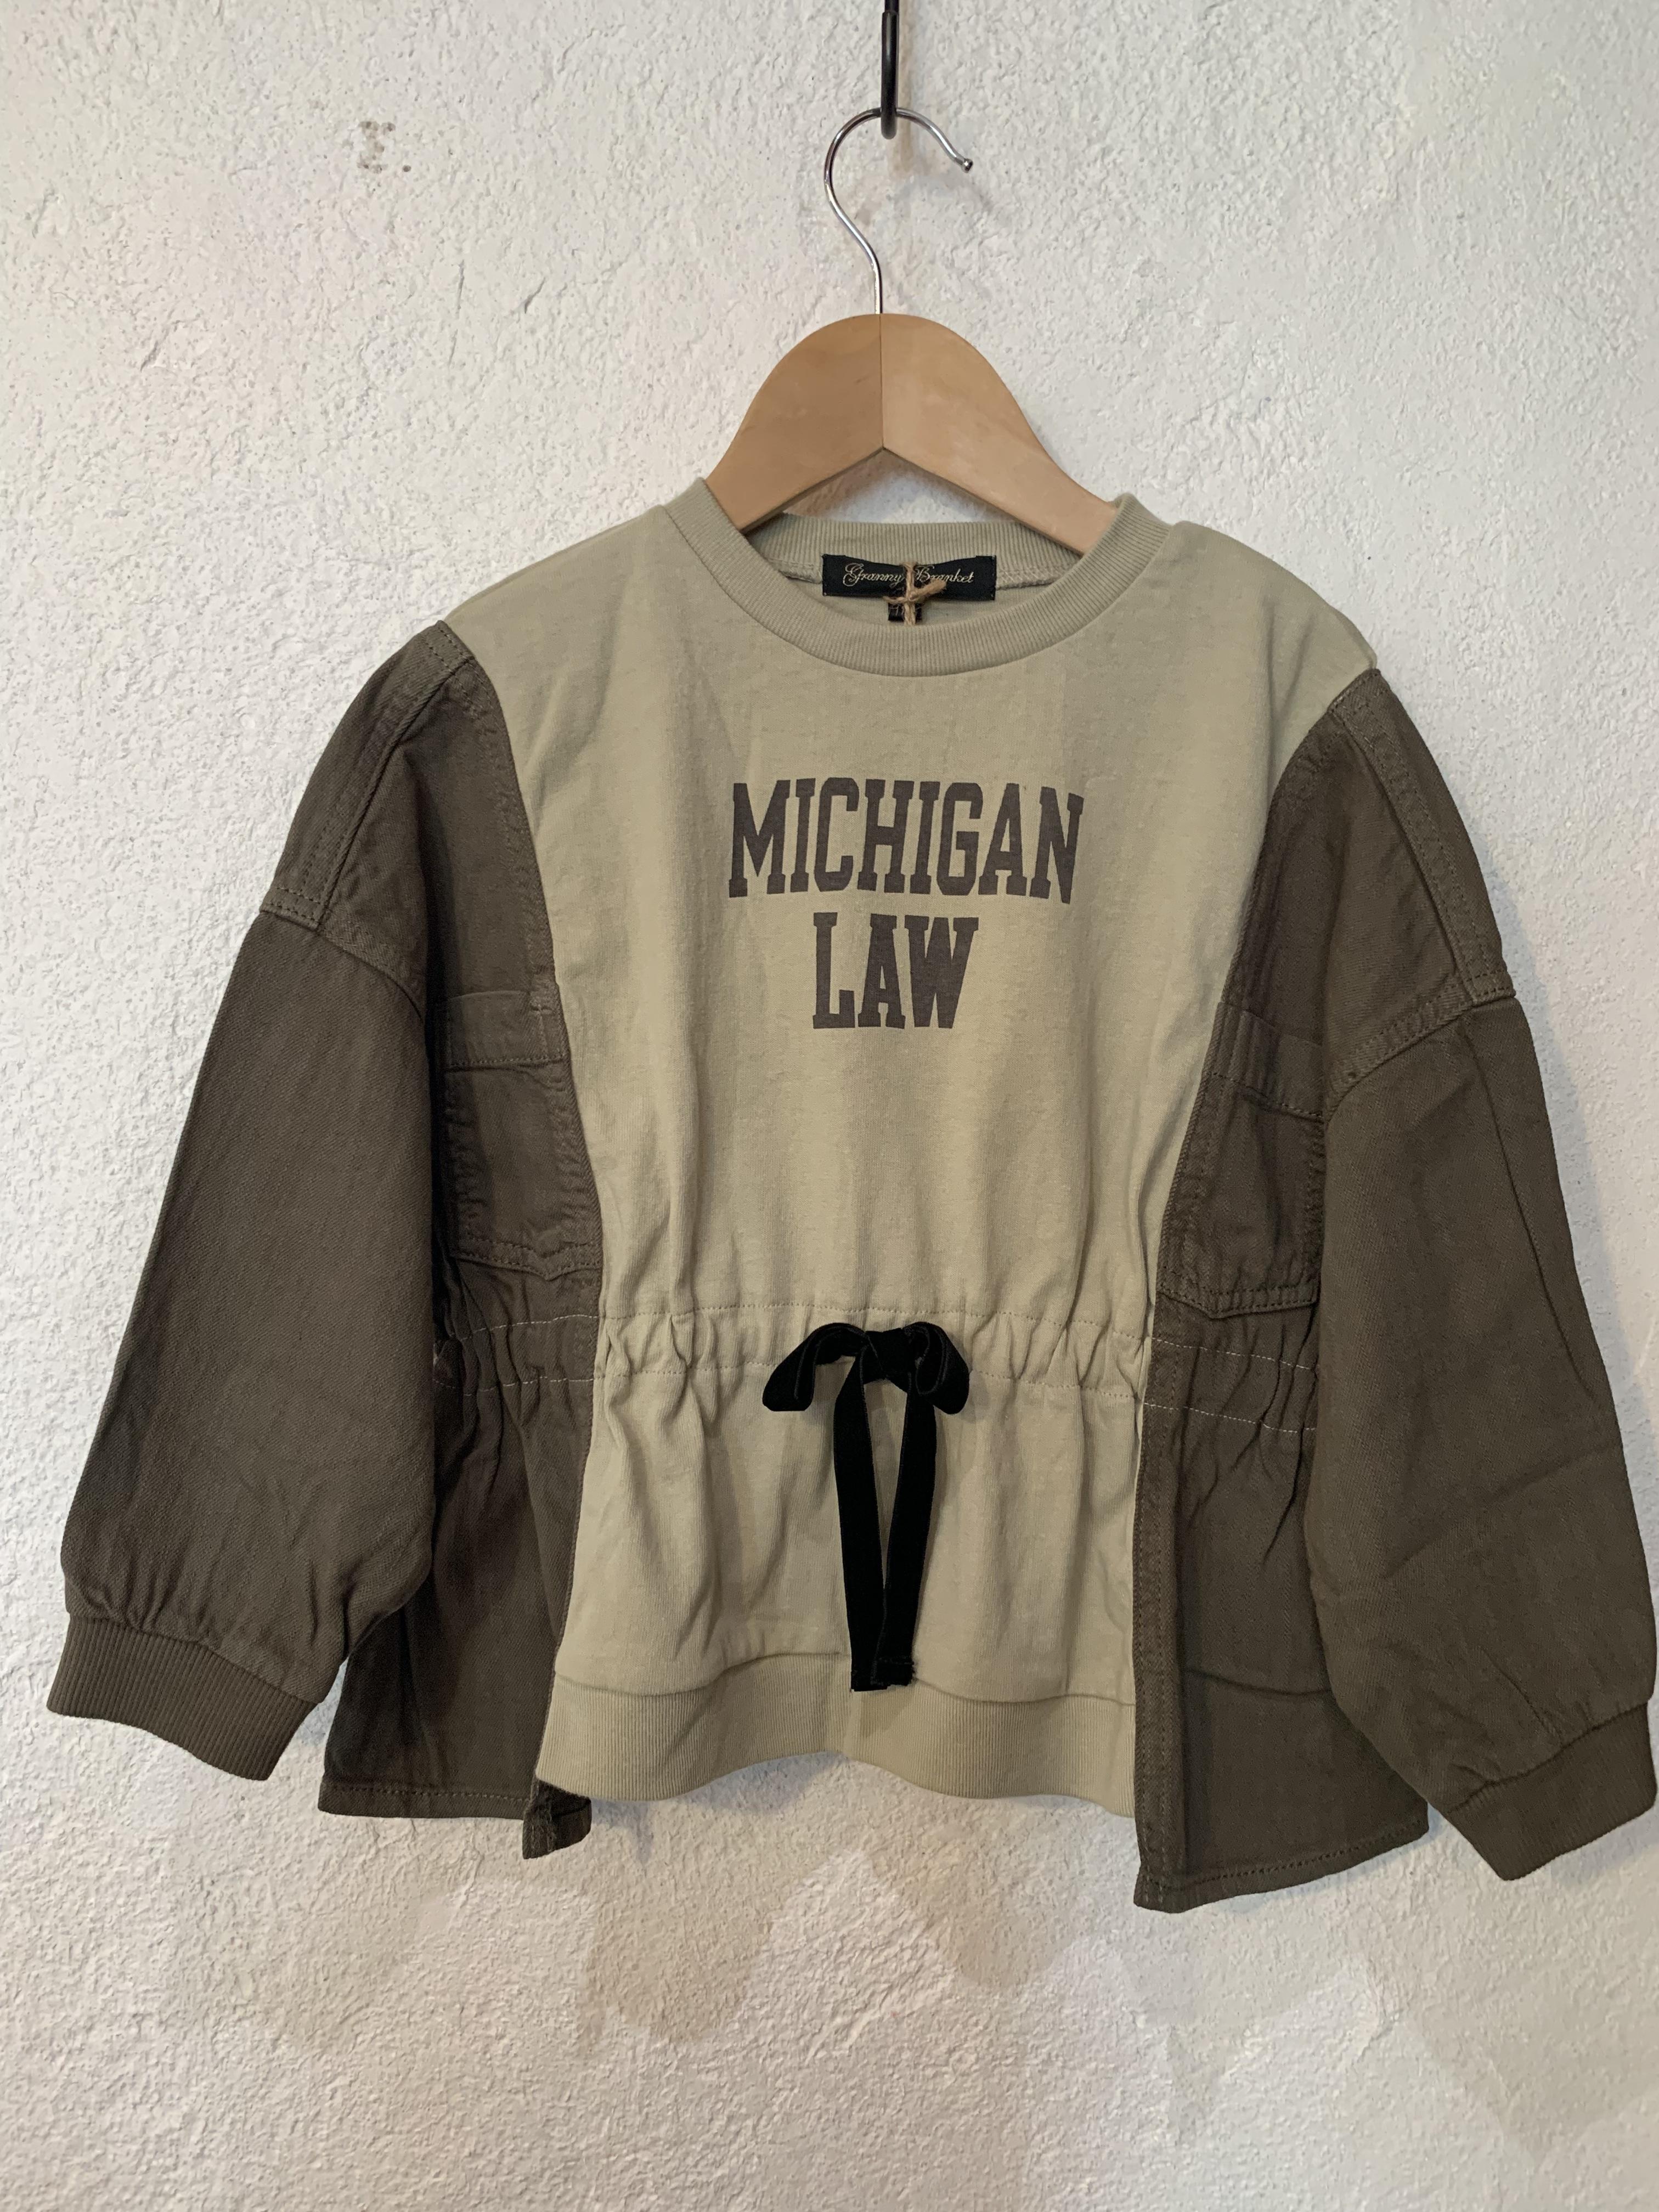 KIDS:granny branket/リメイクギャザーTシャツ 150.160(S、M)㎝